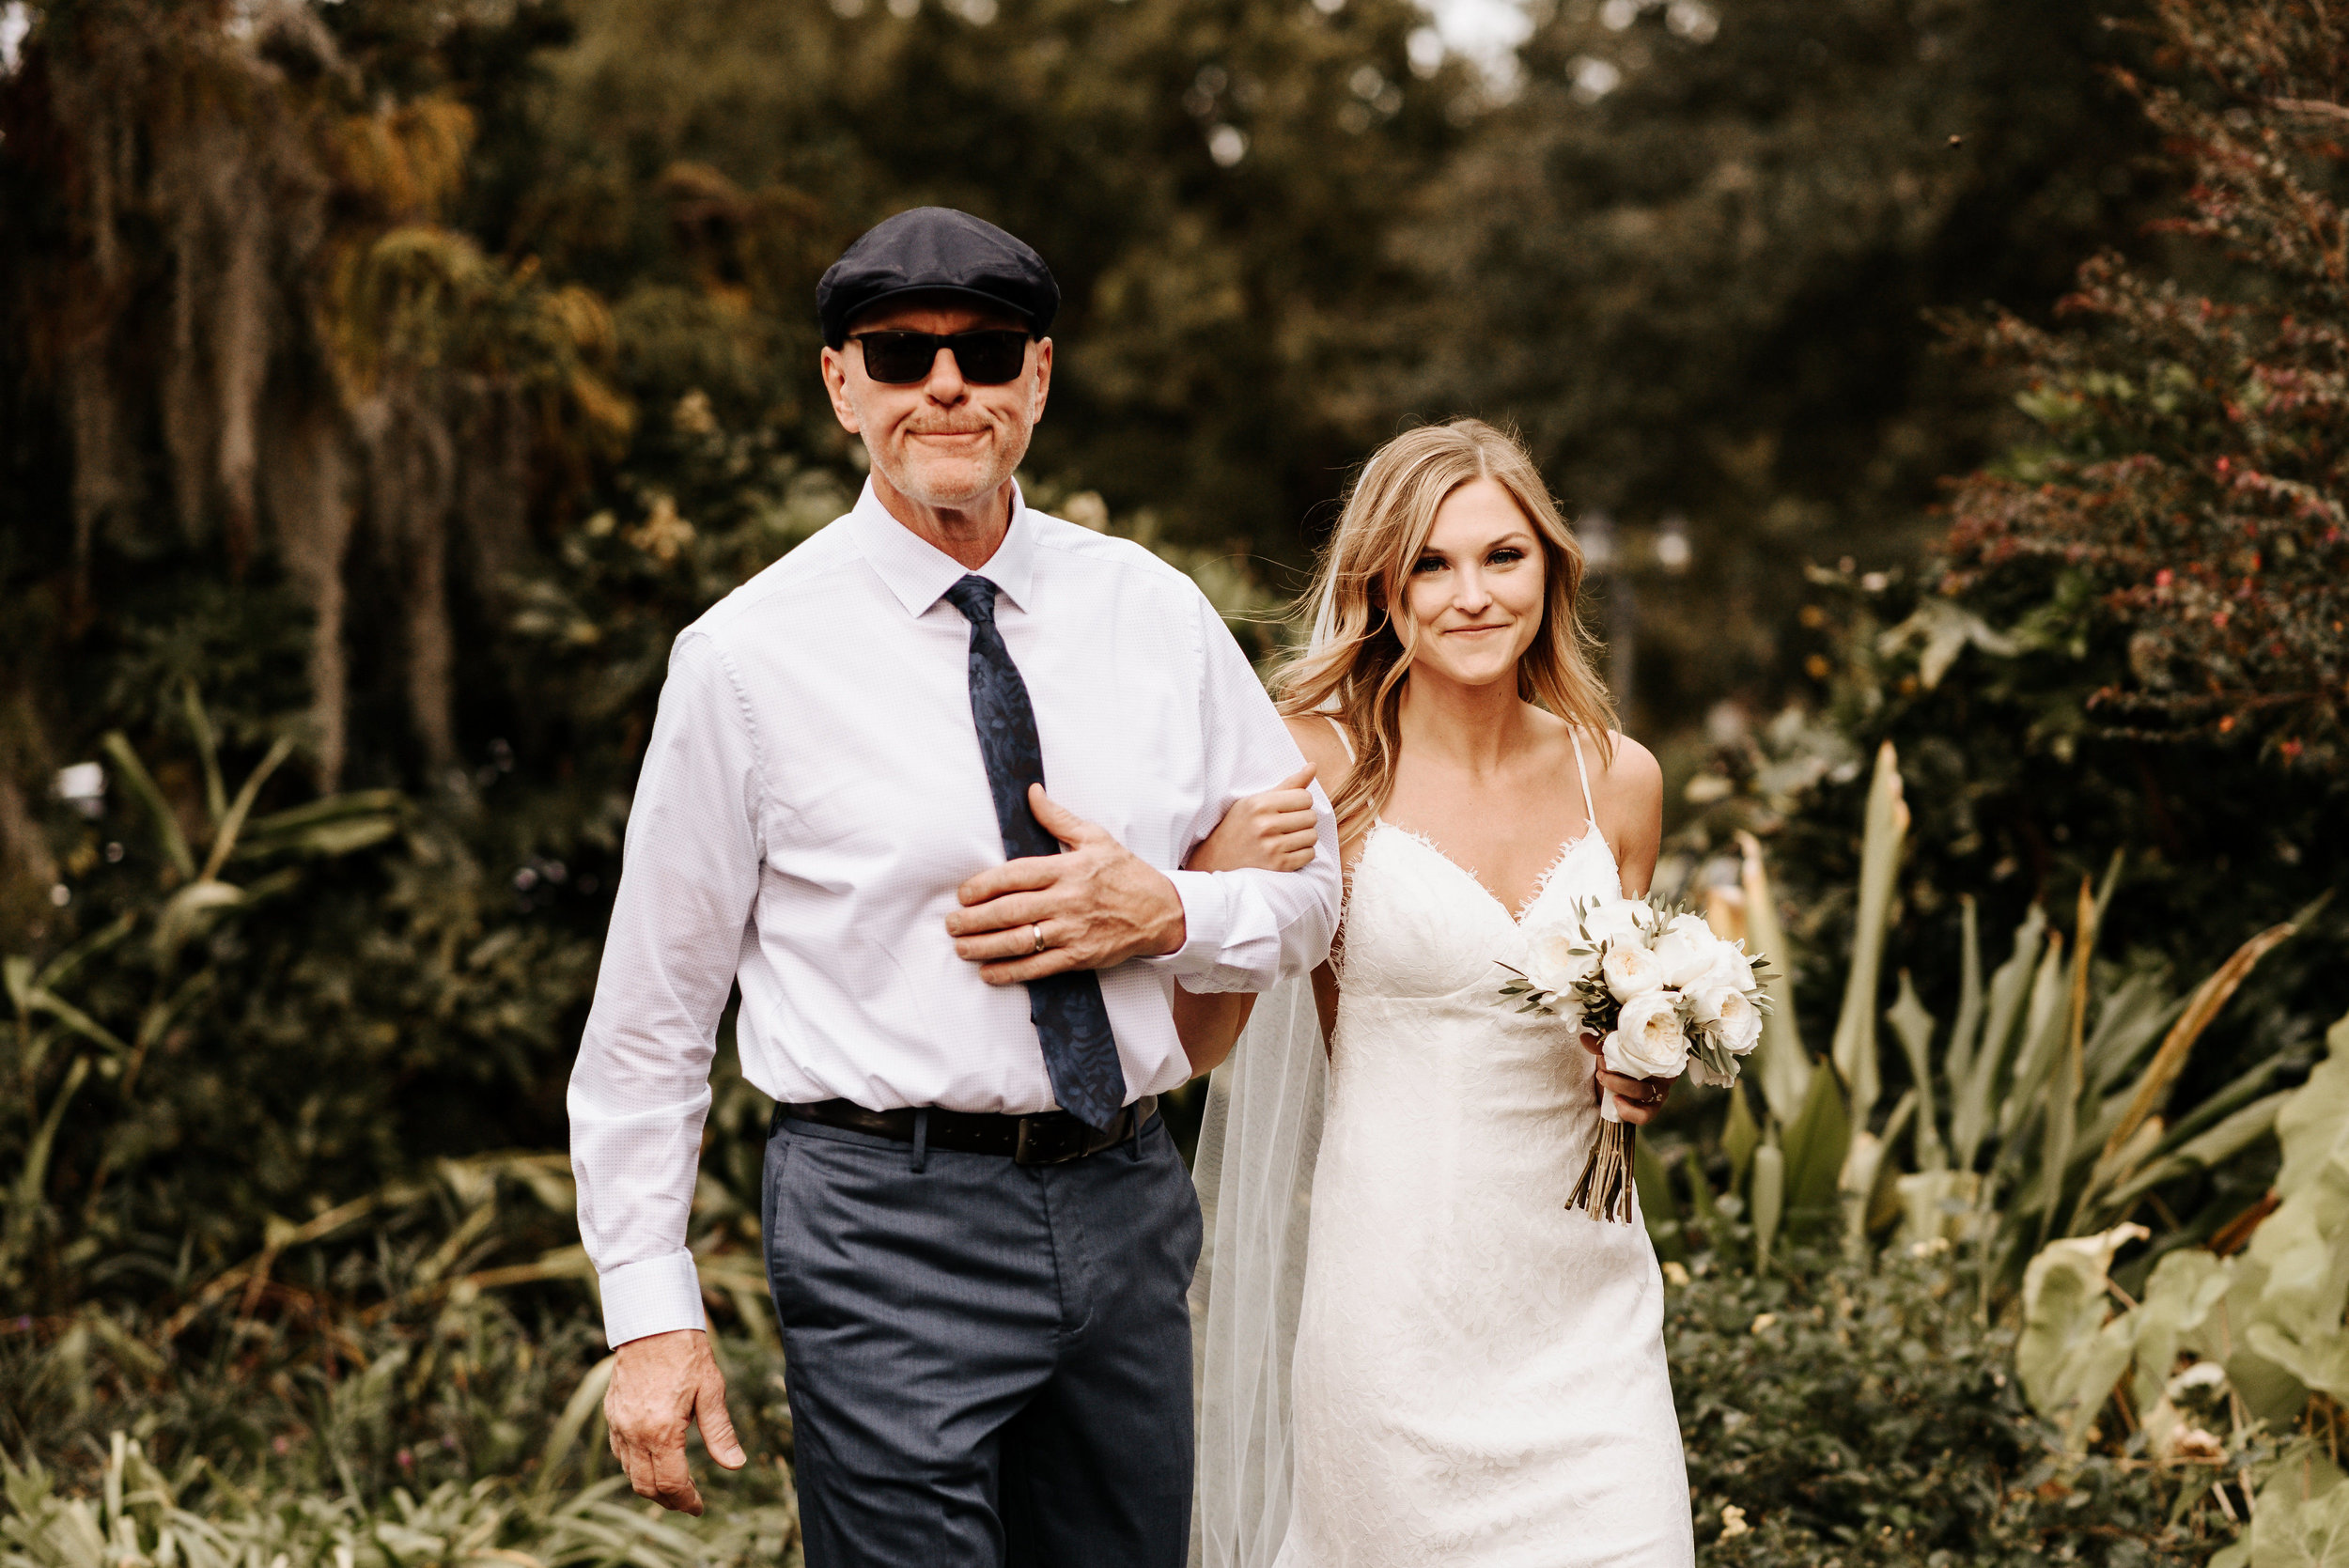 Kourtney_Sean_Savannah_Georgia_Wedding_Wormsloe_Histroic_Site_Coastal_Georgia_Botanical_Gardens_Photography_by_V_6929_2.jpg